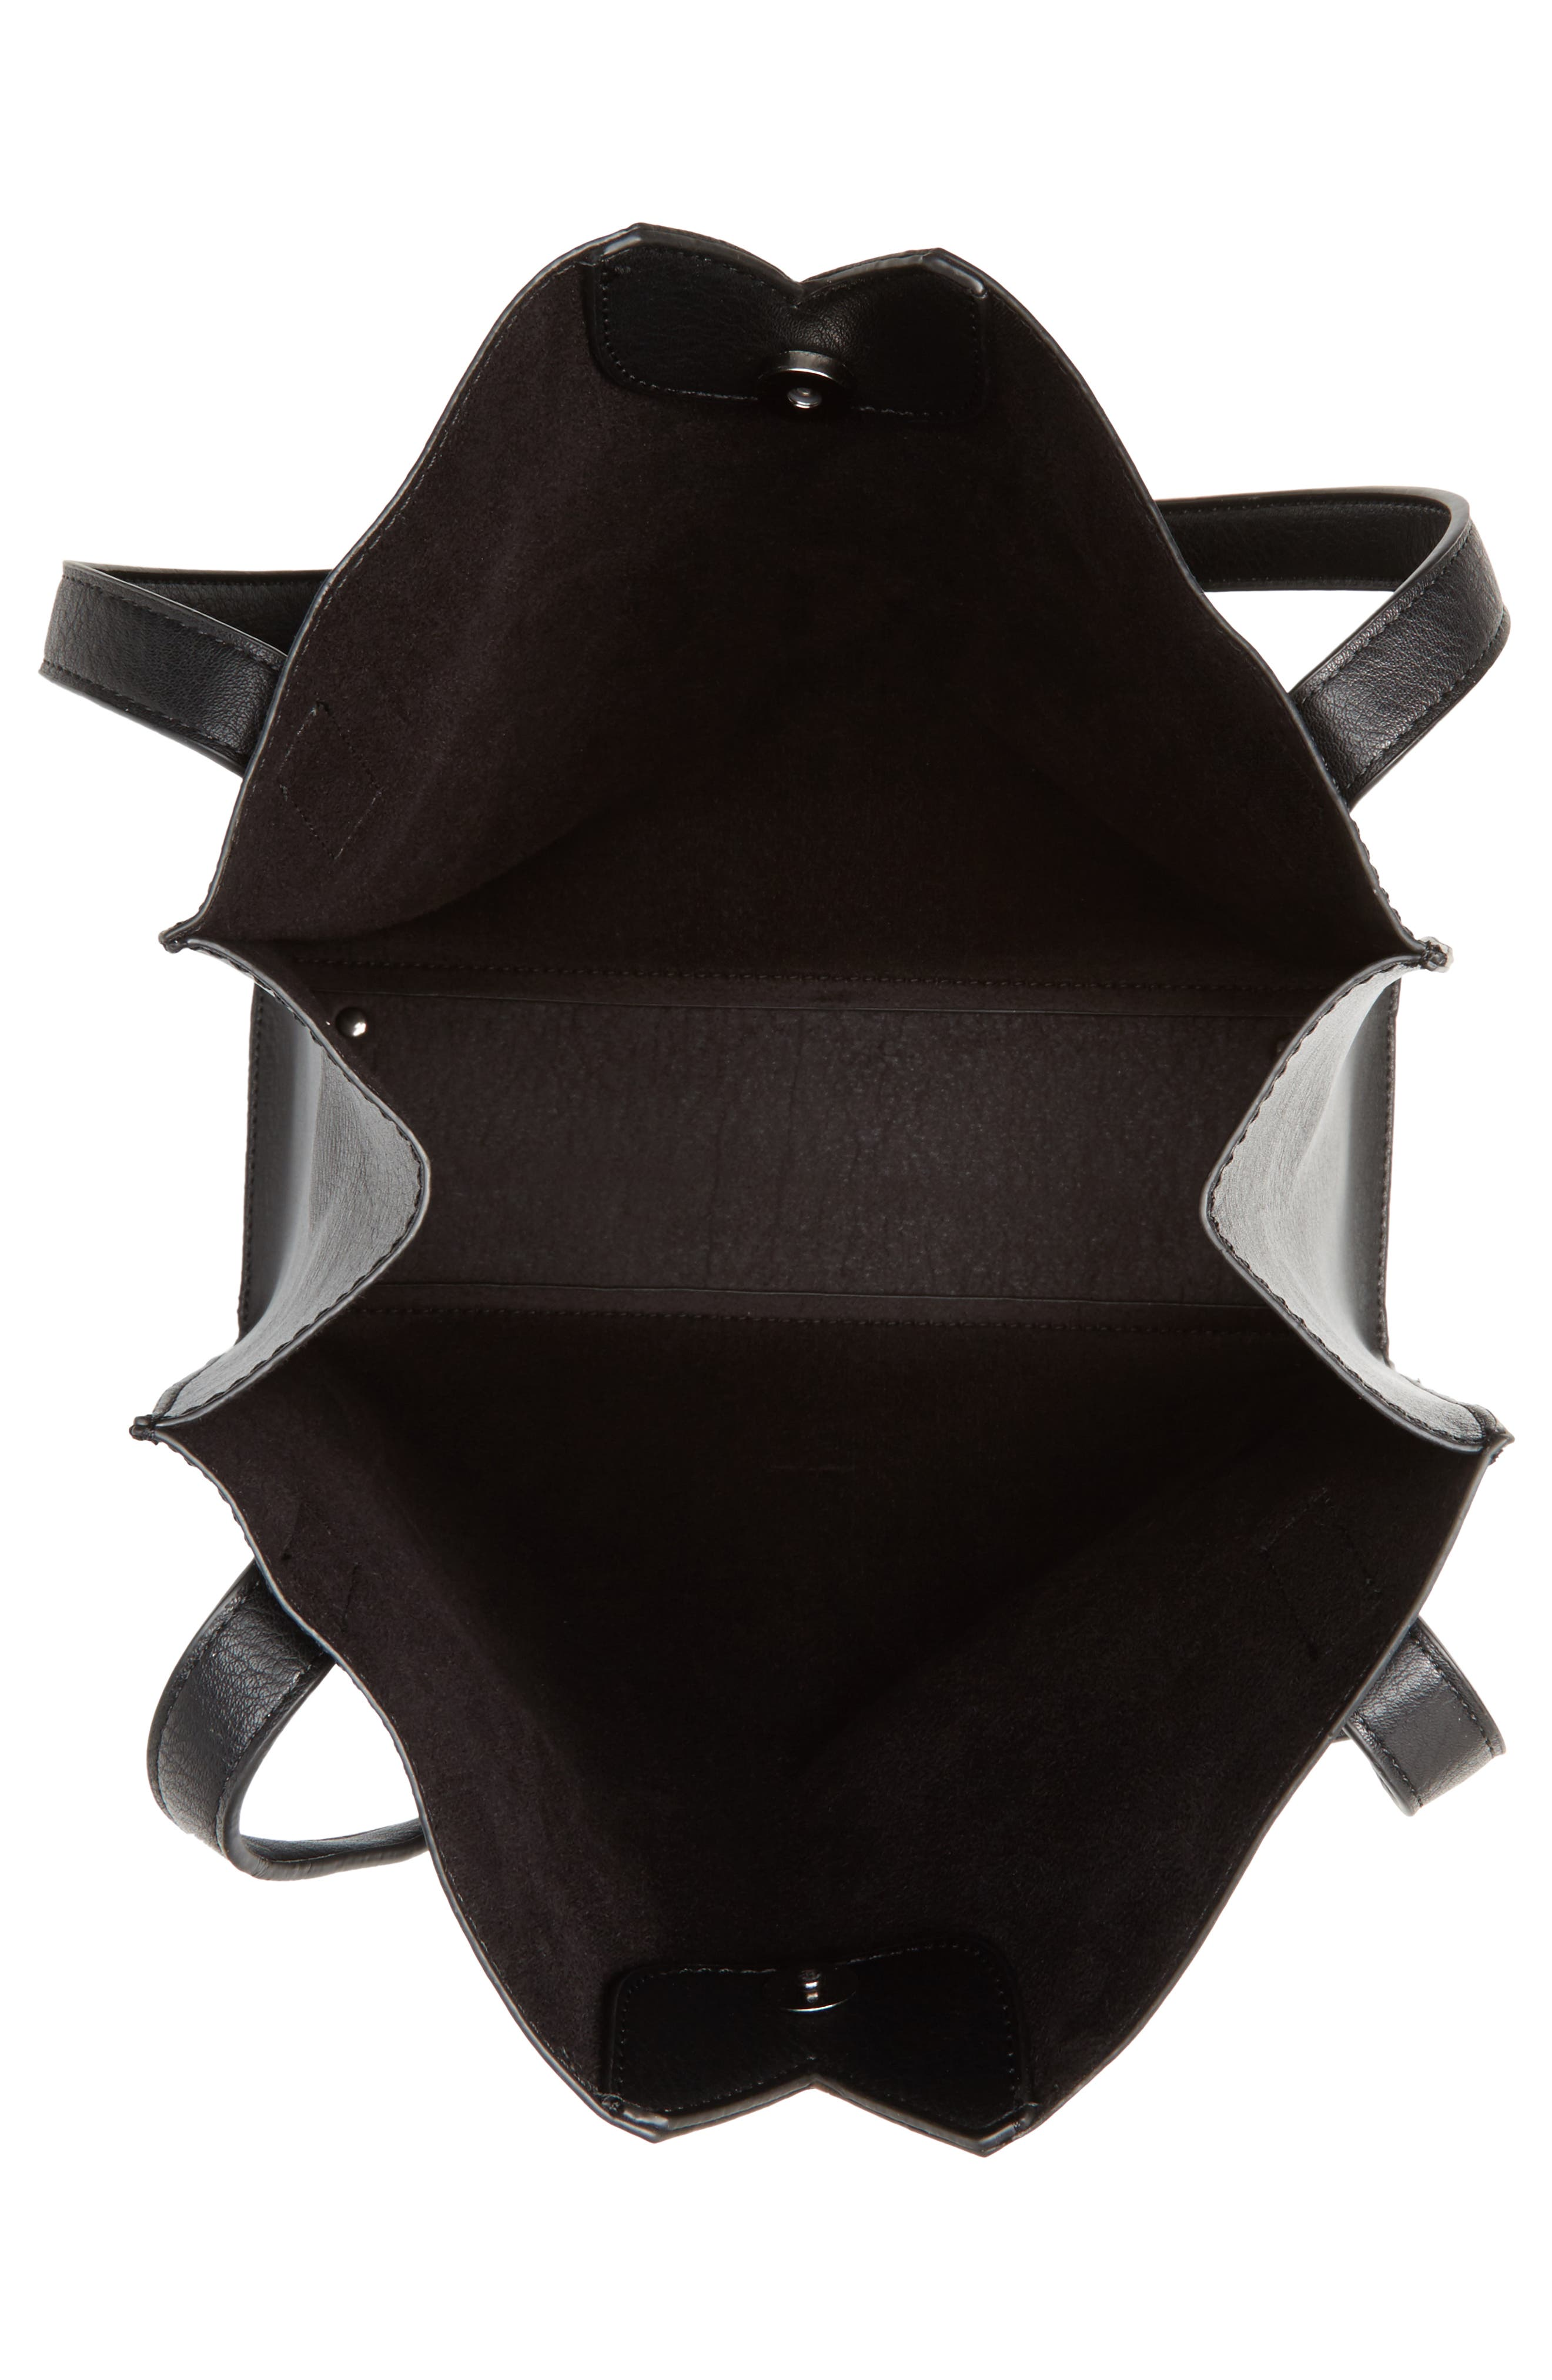 Alicia Faux Leather Tote Bag & Pouch Set,                             Alternate thumbnail 4, color,                             001